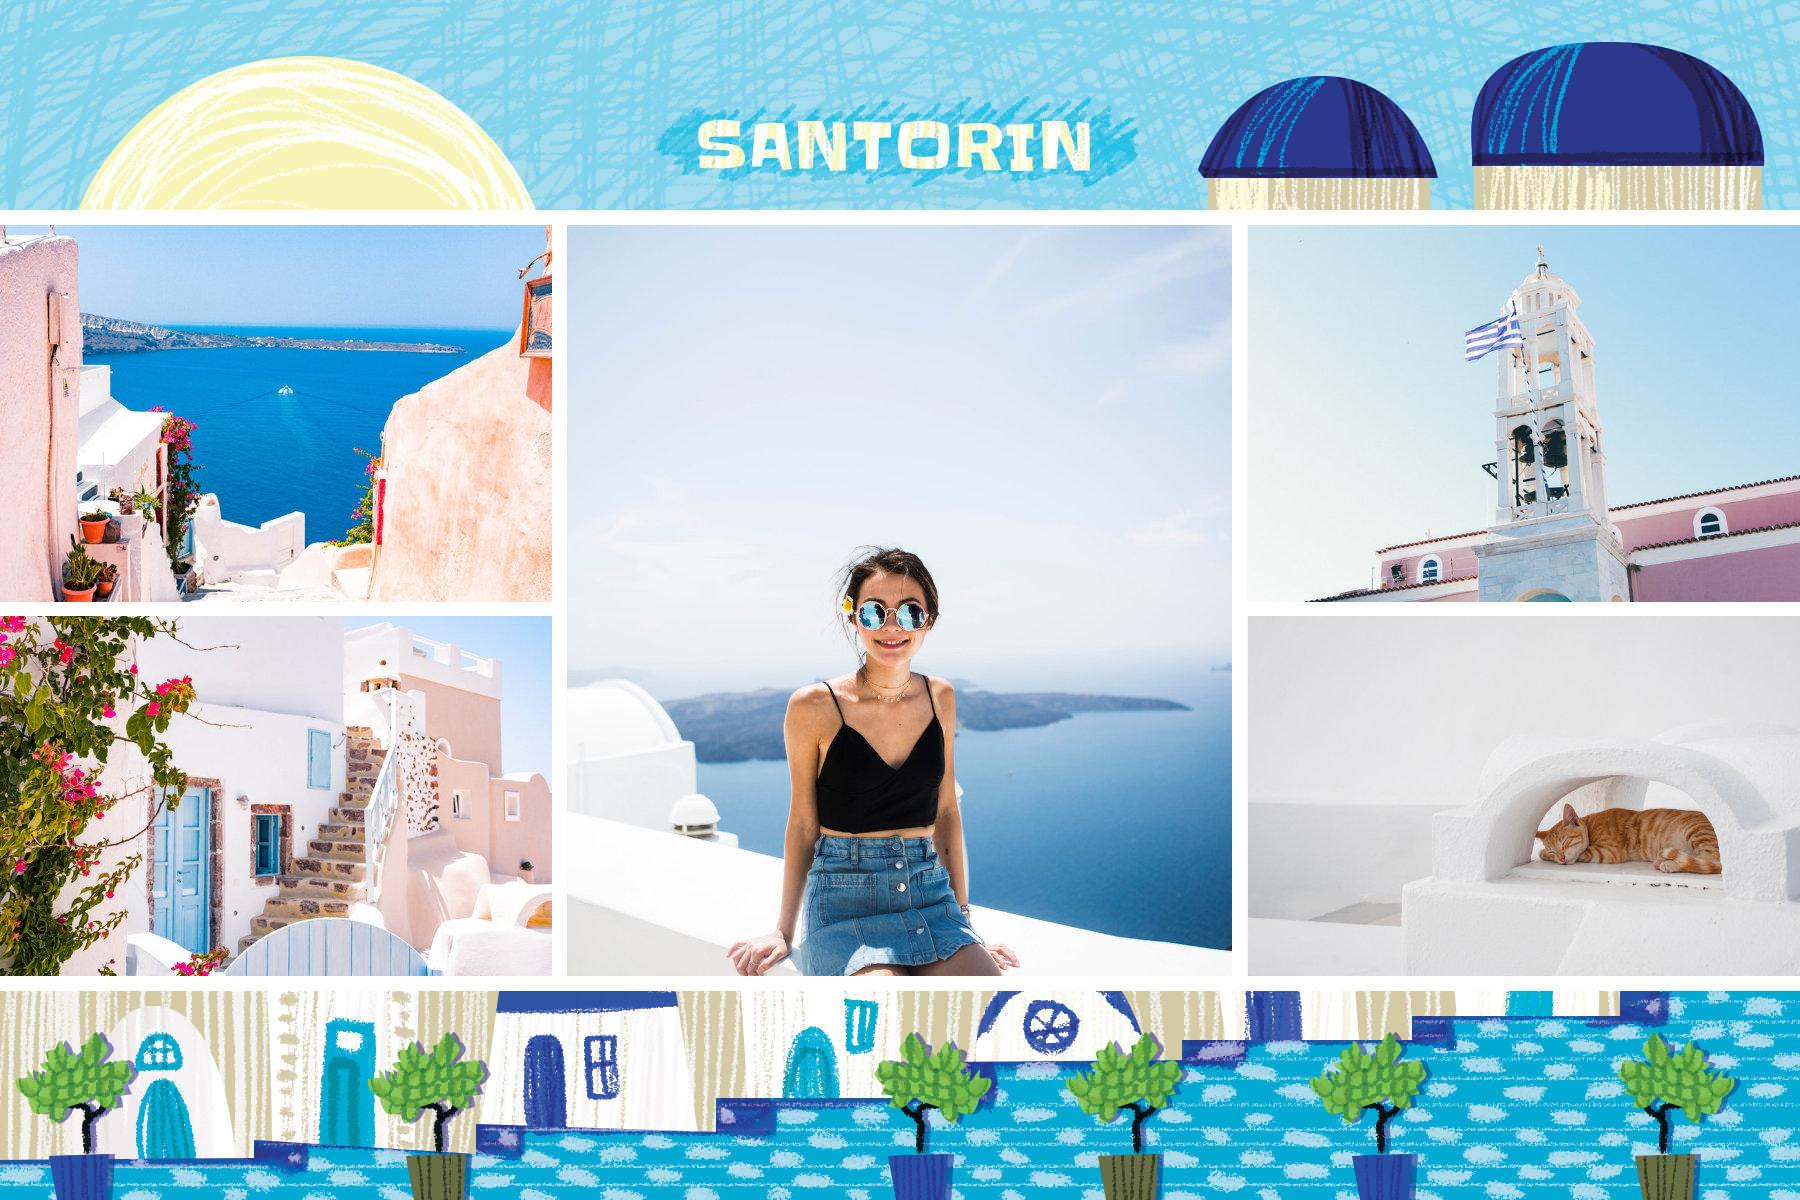 carte postale vacances a santorin grece